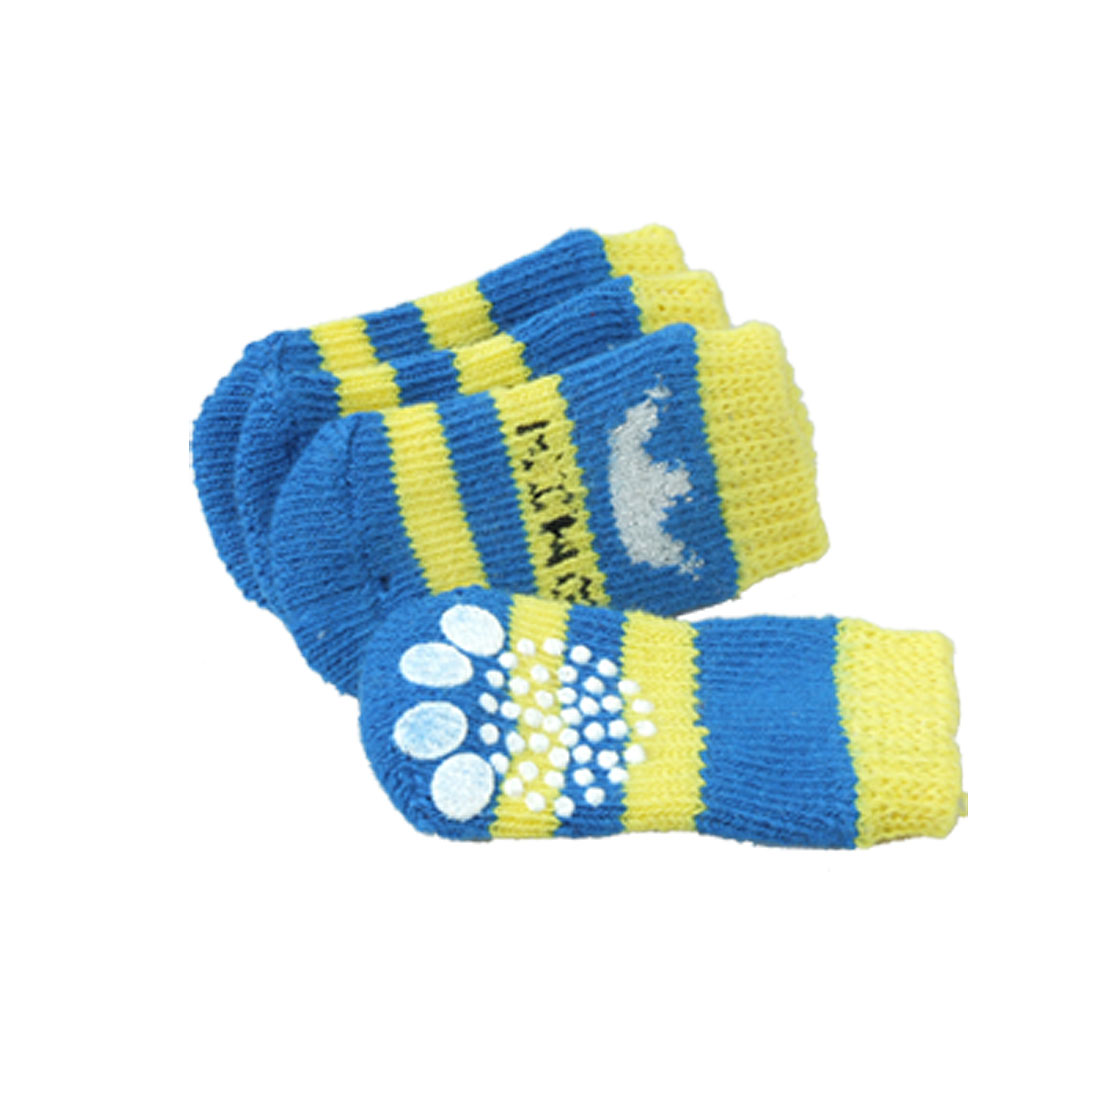 Dog Socks w. Crown Pattern 6.7 x 3.2cm